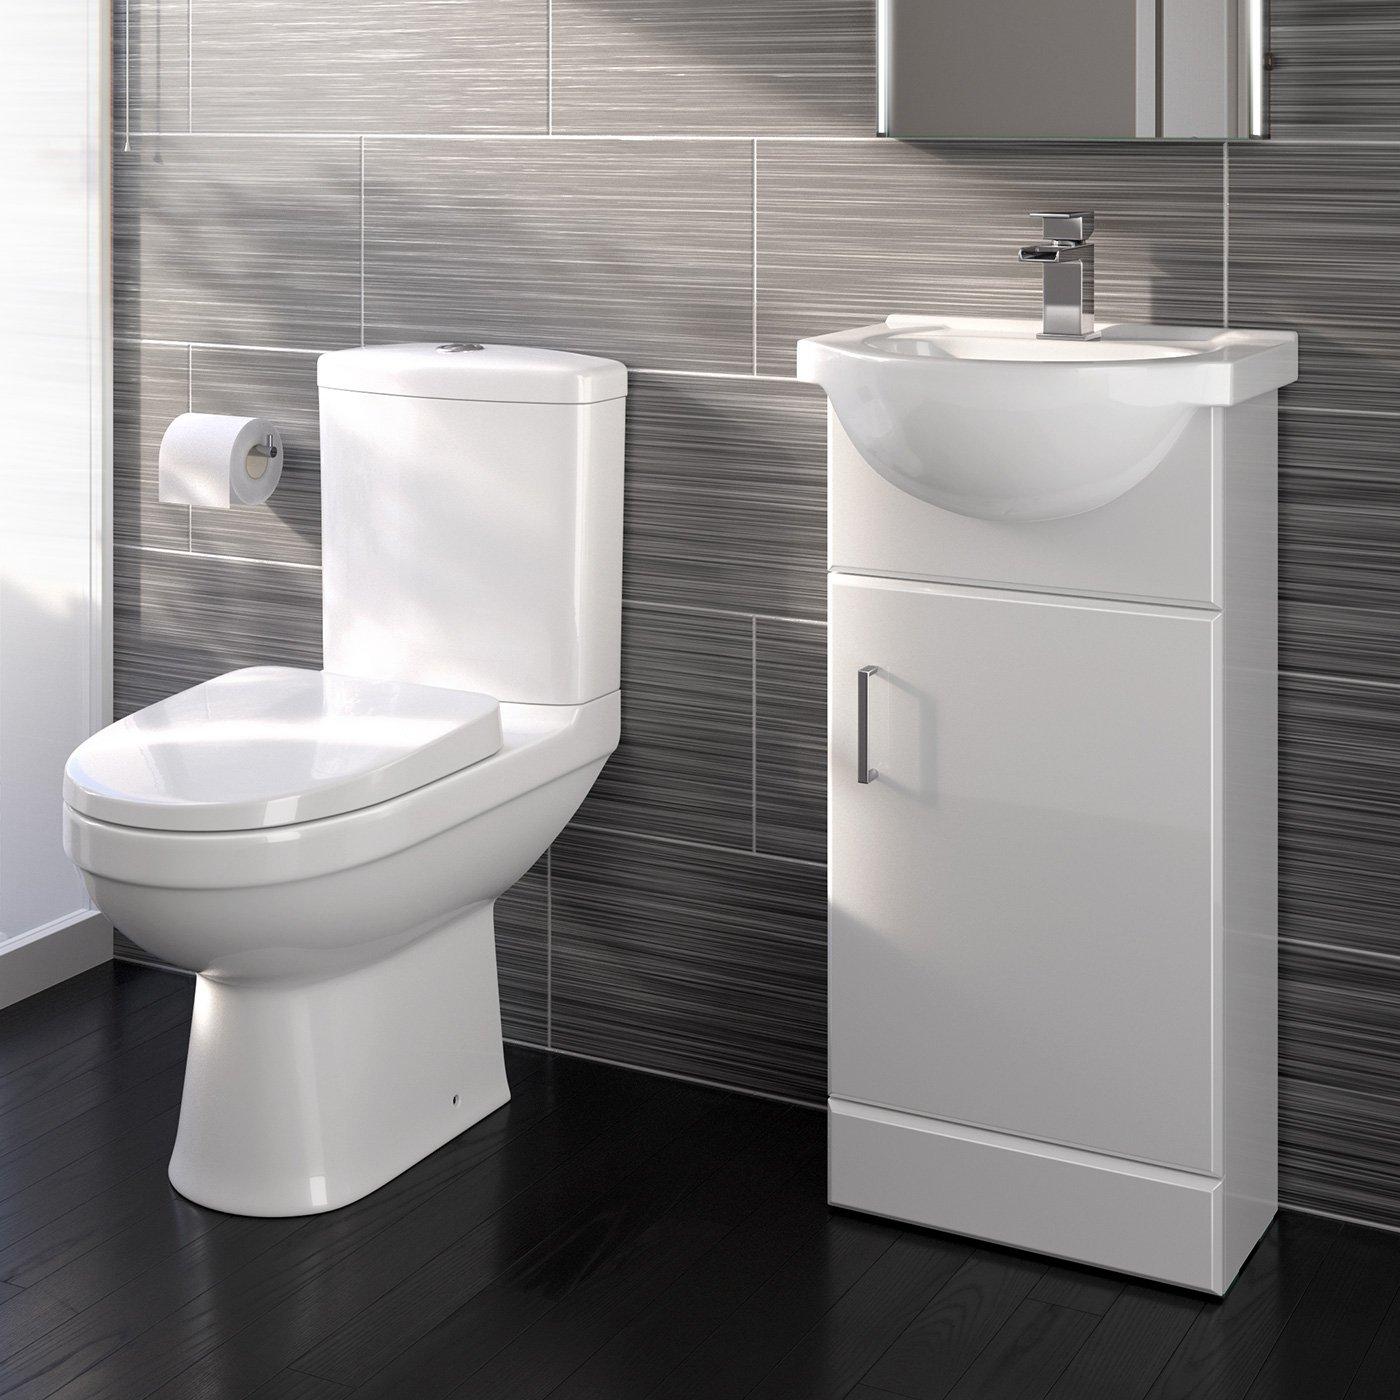 Modern Close Coupled Toilet Bathroom Vanity Storage Unit Basin Cloakroom Set iBathUK